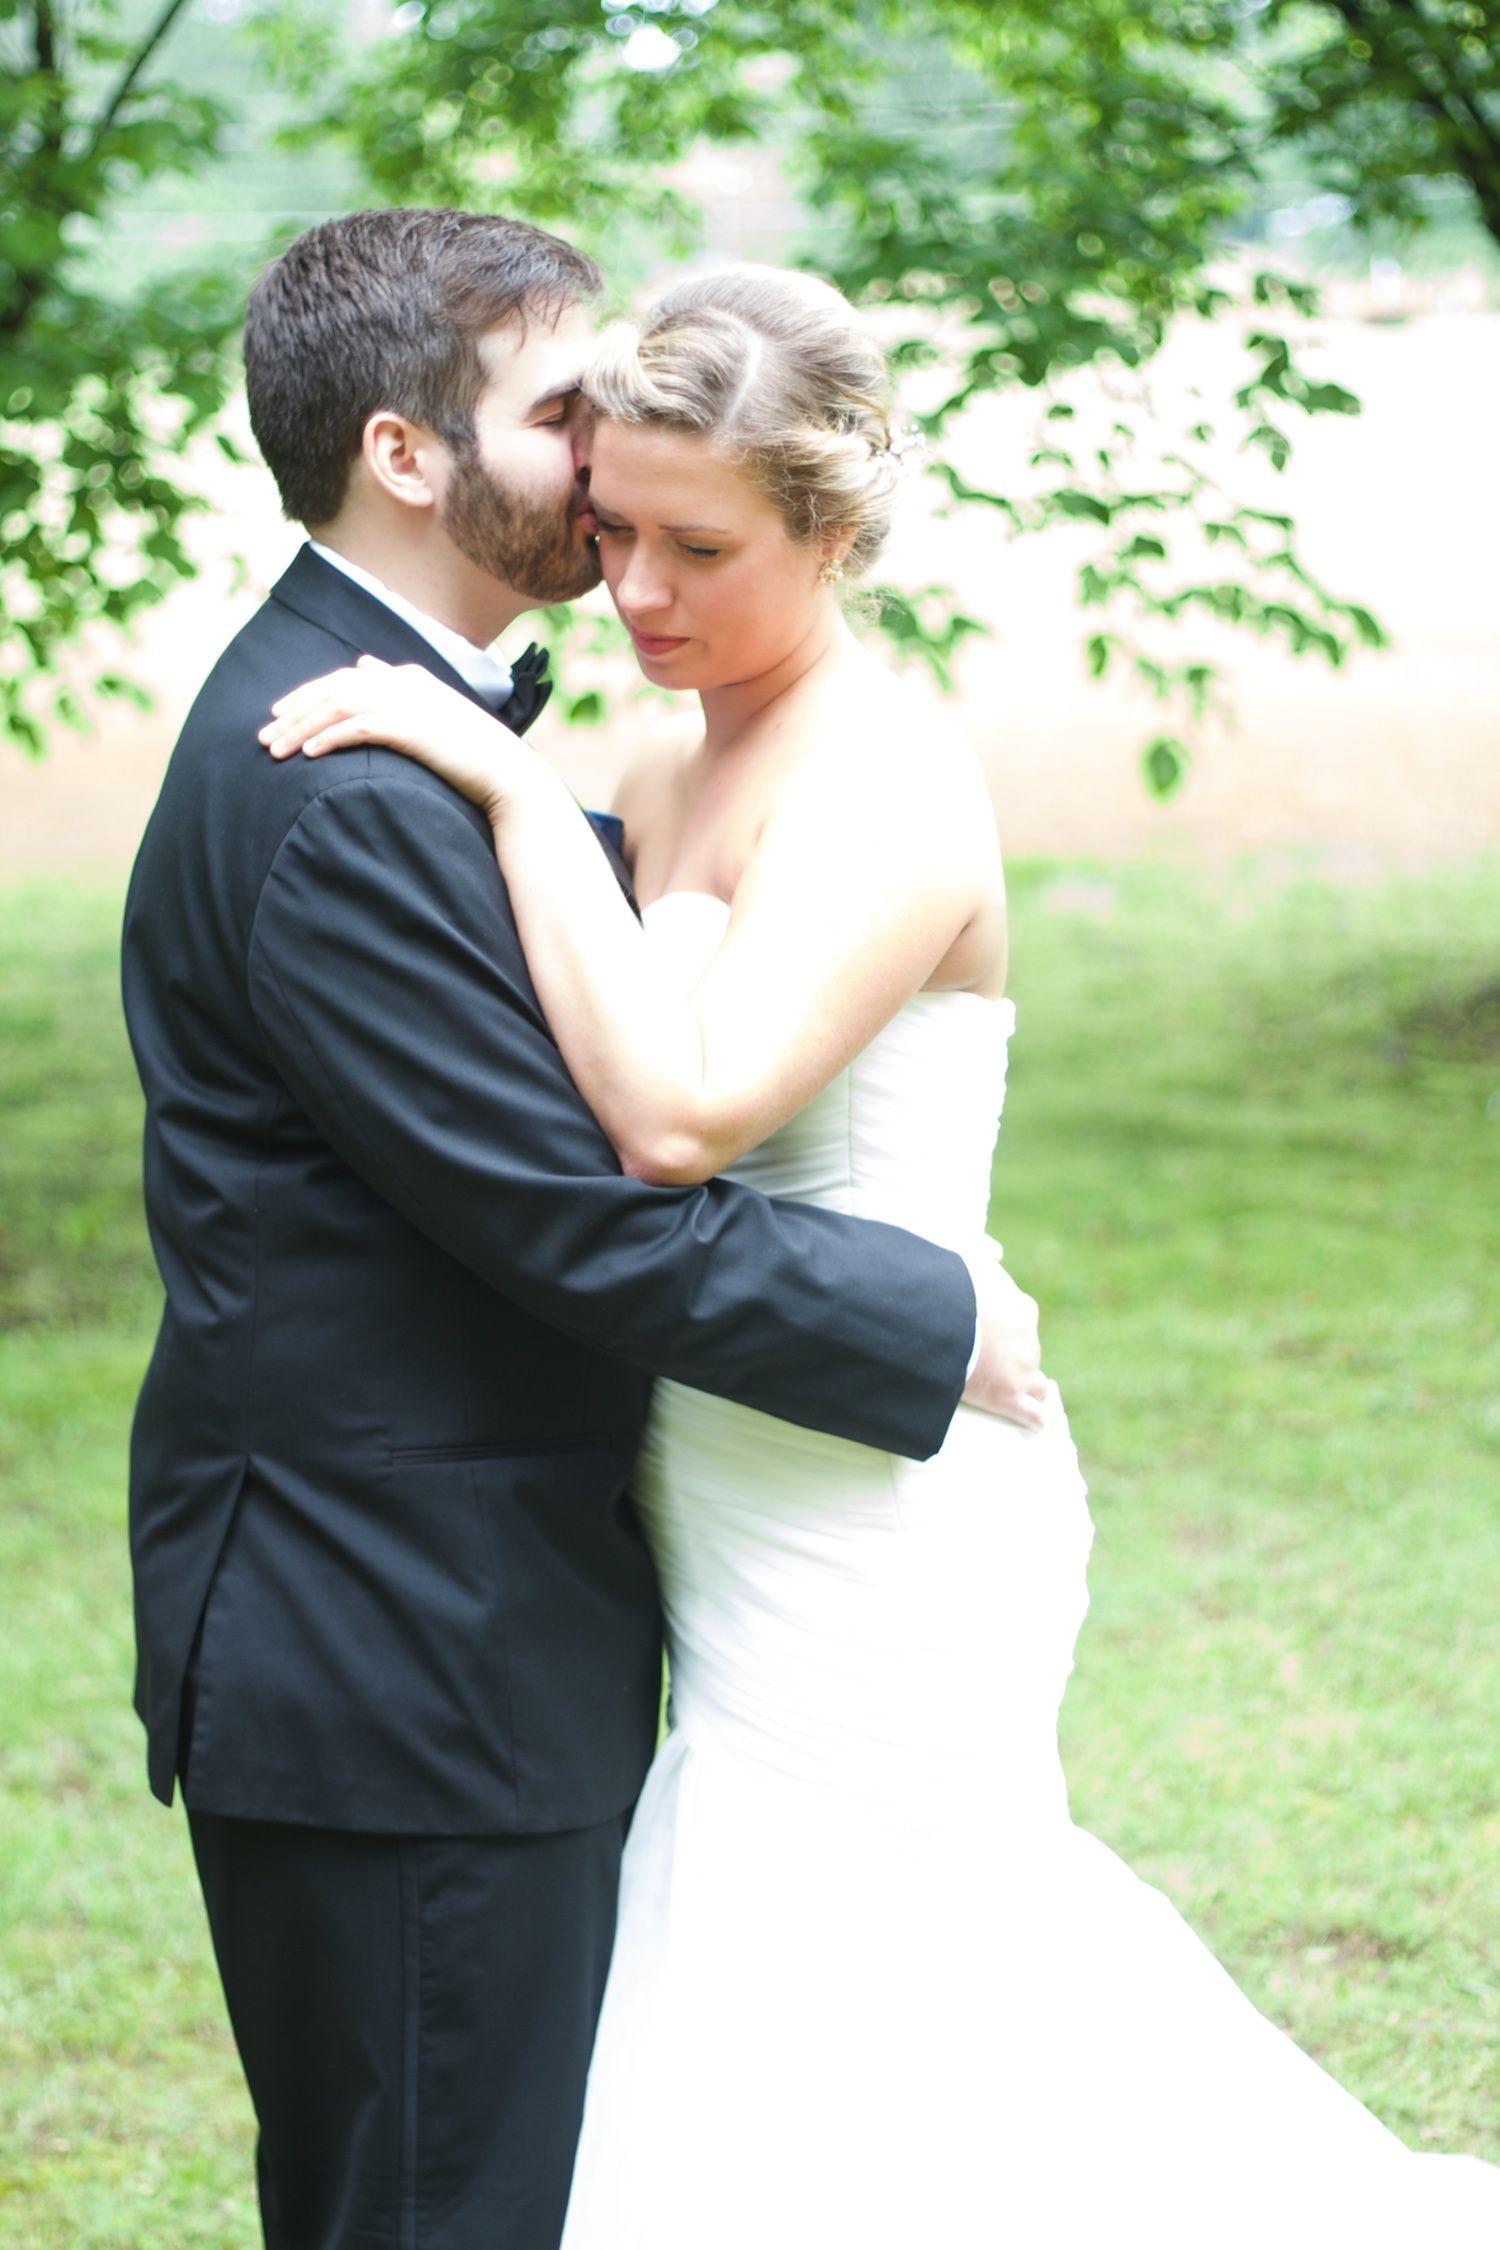 Leah Smith And Brandon Davis Wed In Collierville Tn Wedding Backyard Garden